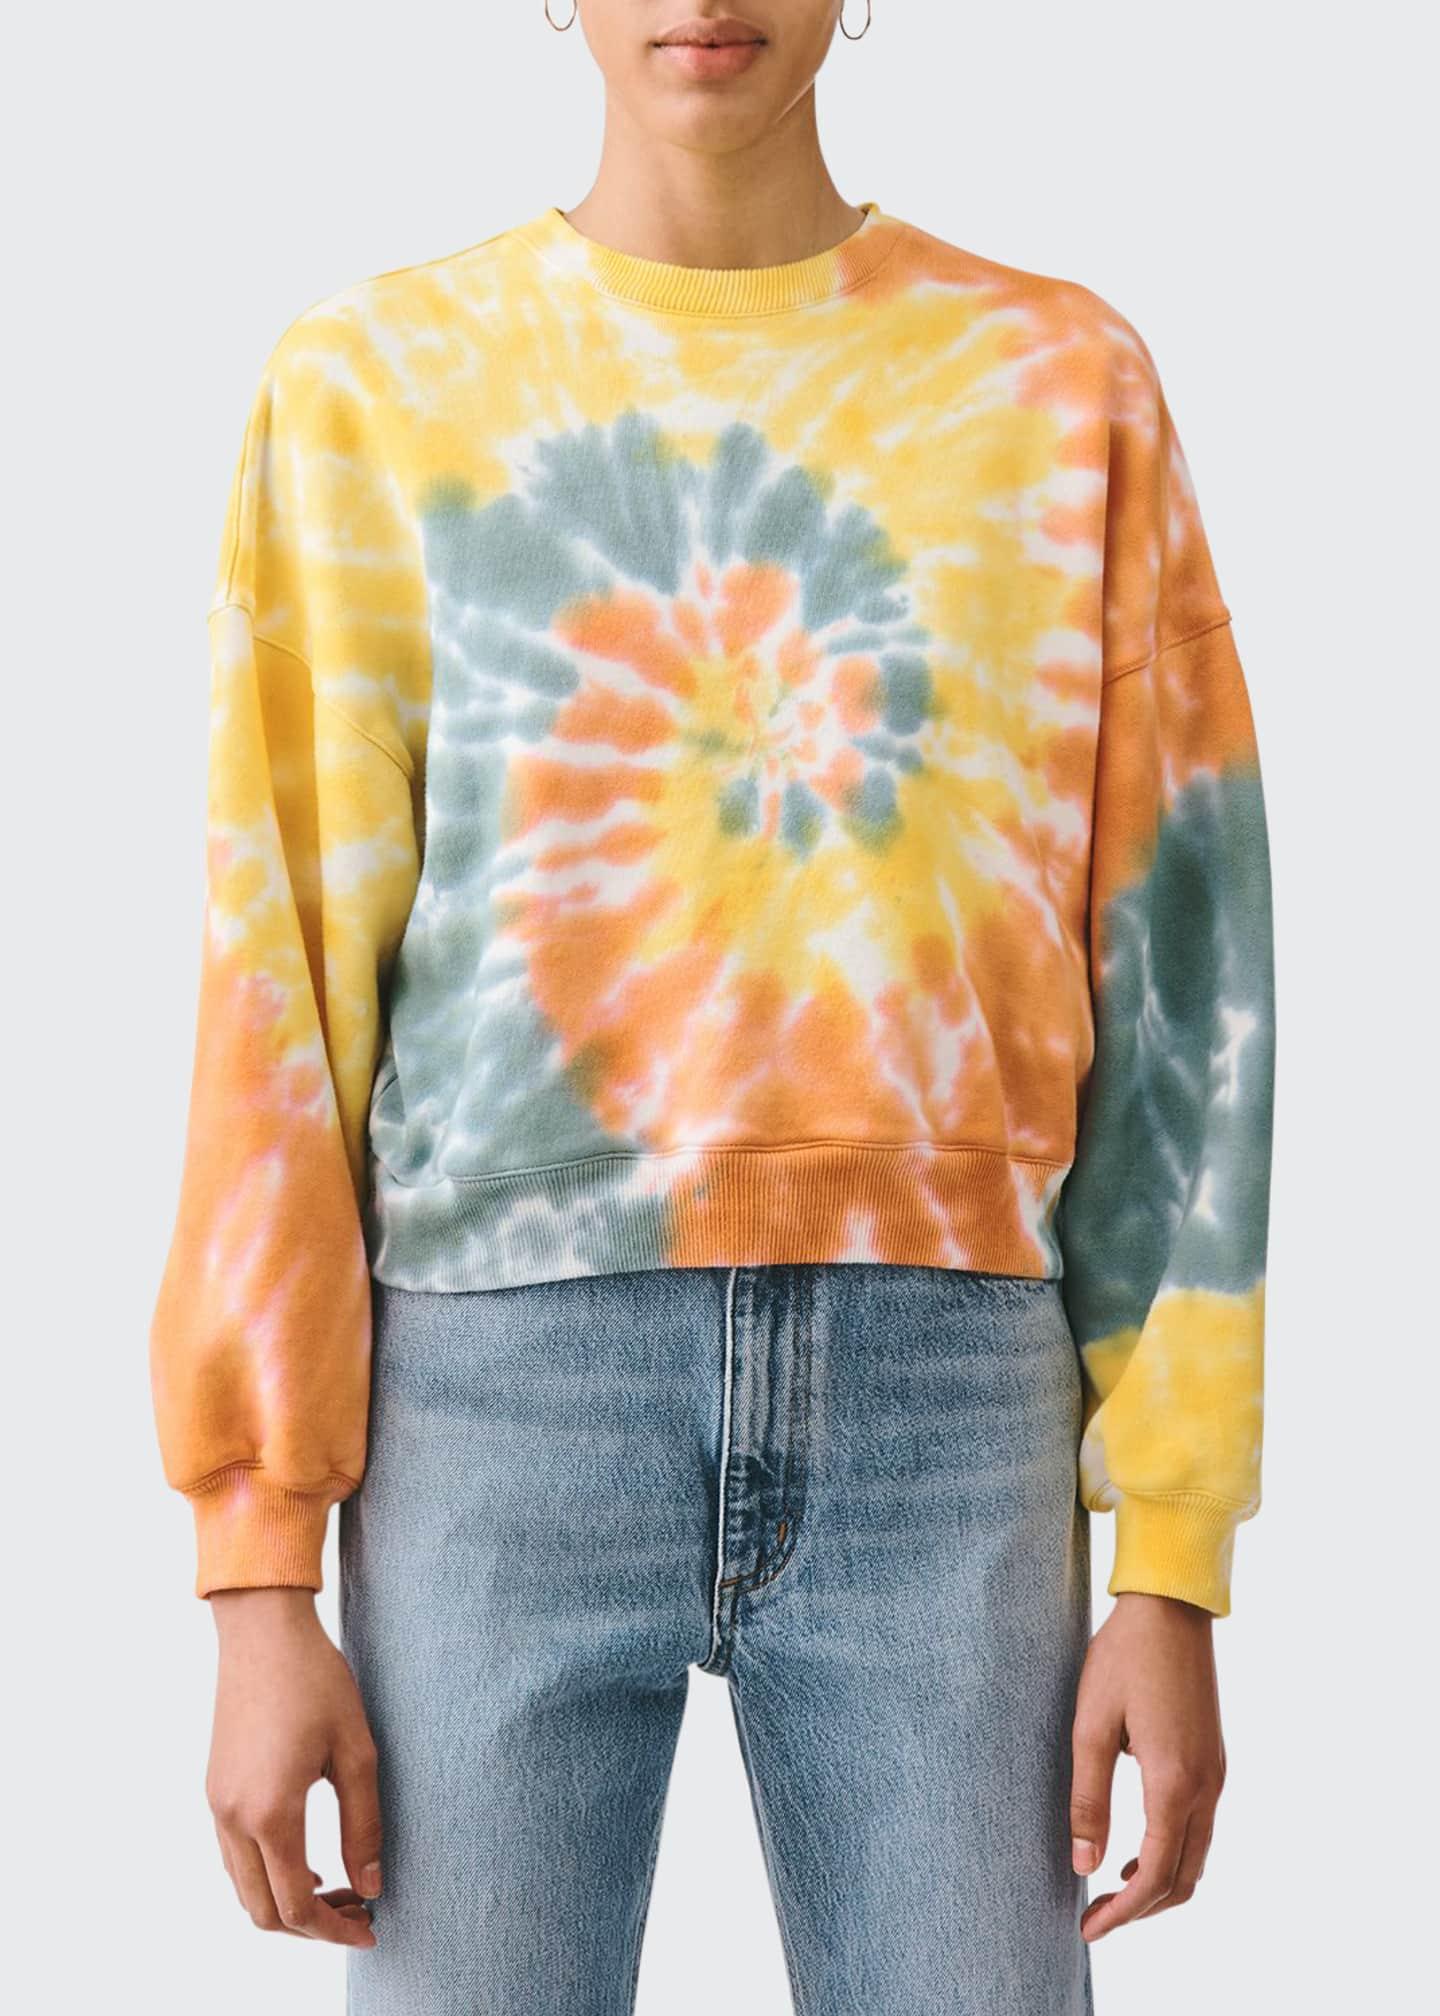 AGOLDE Balloon-Sleeve Tie-Dye Sweatshirt